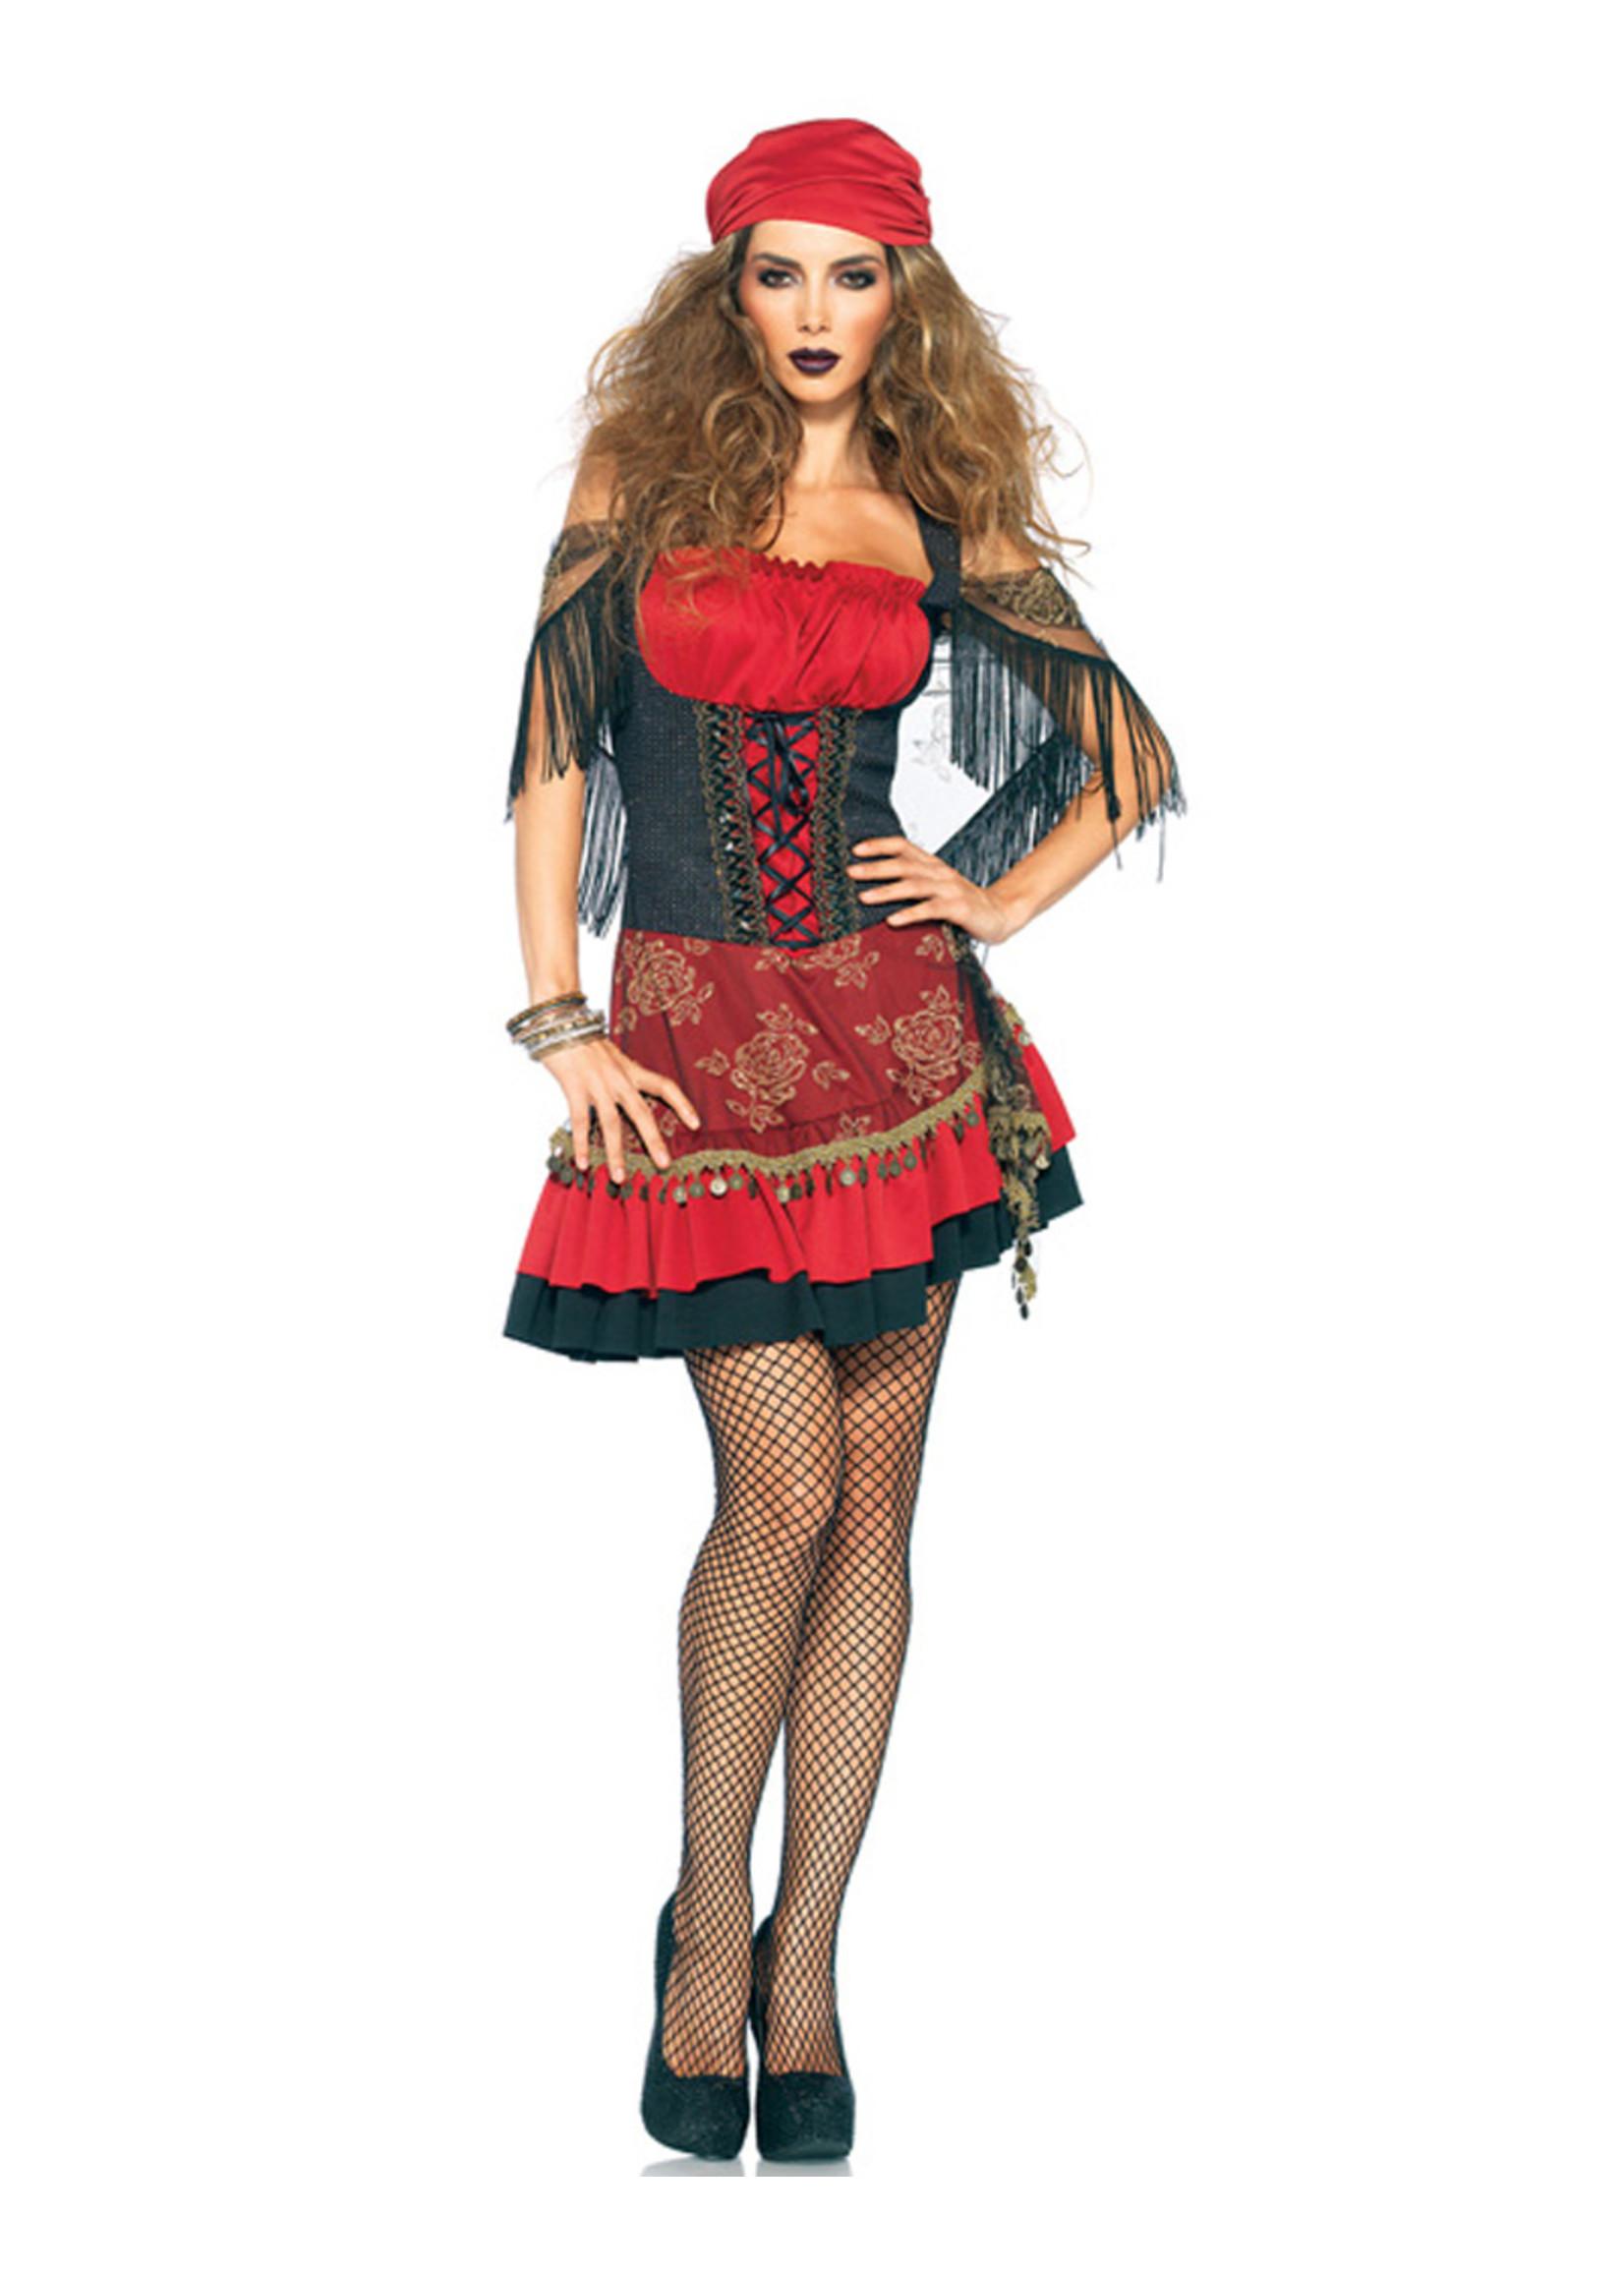 Mystic Vixen Costume - Women's